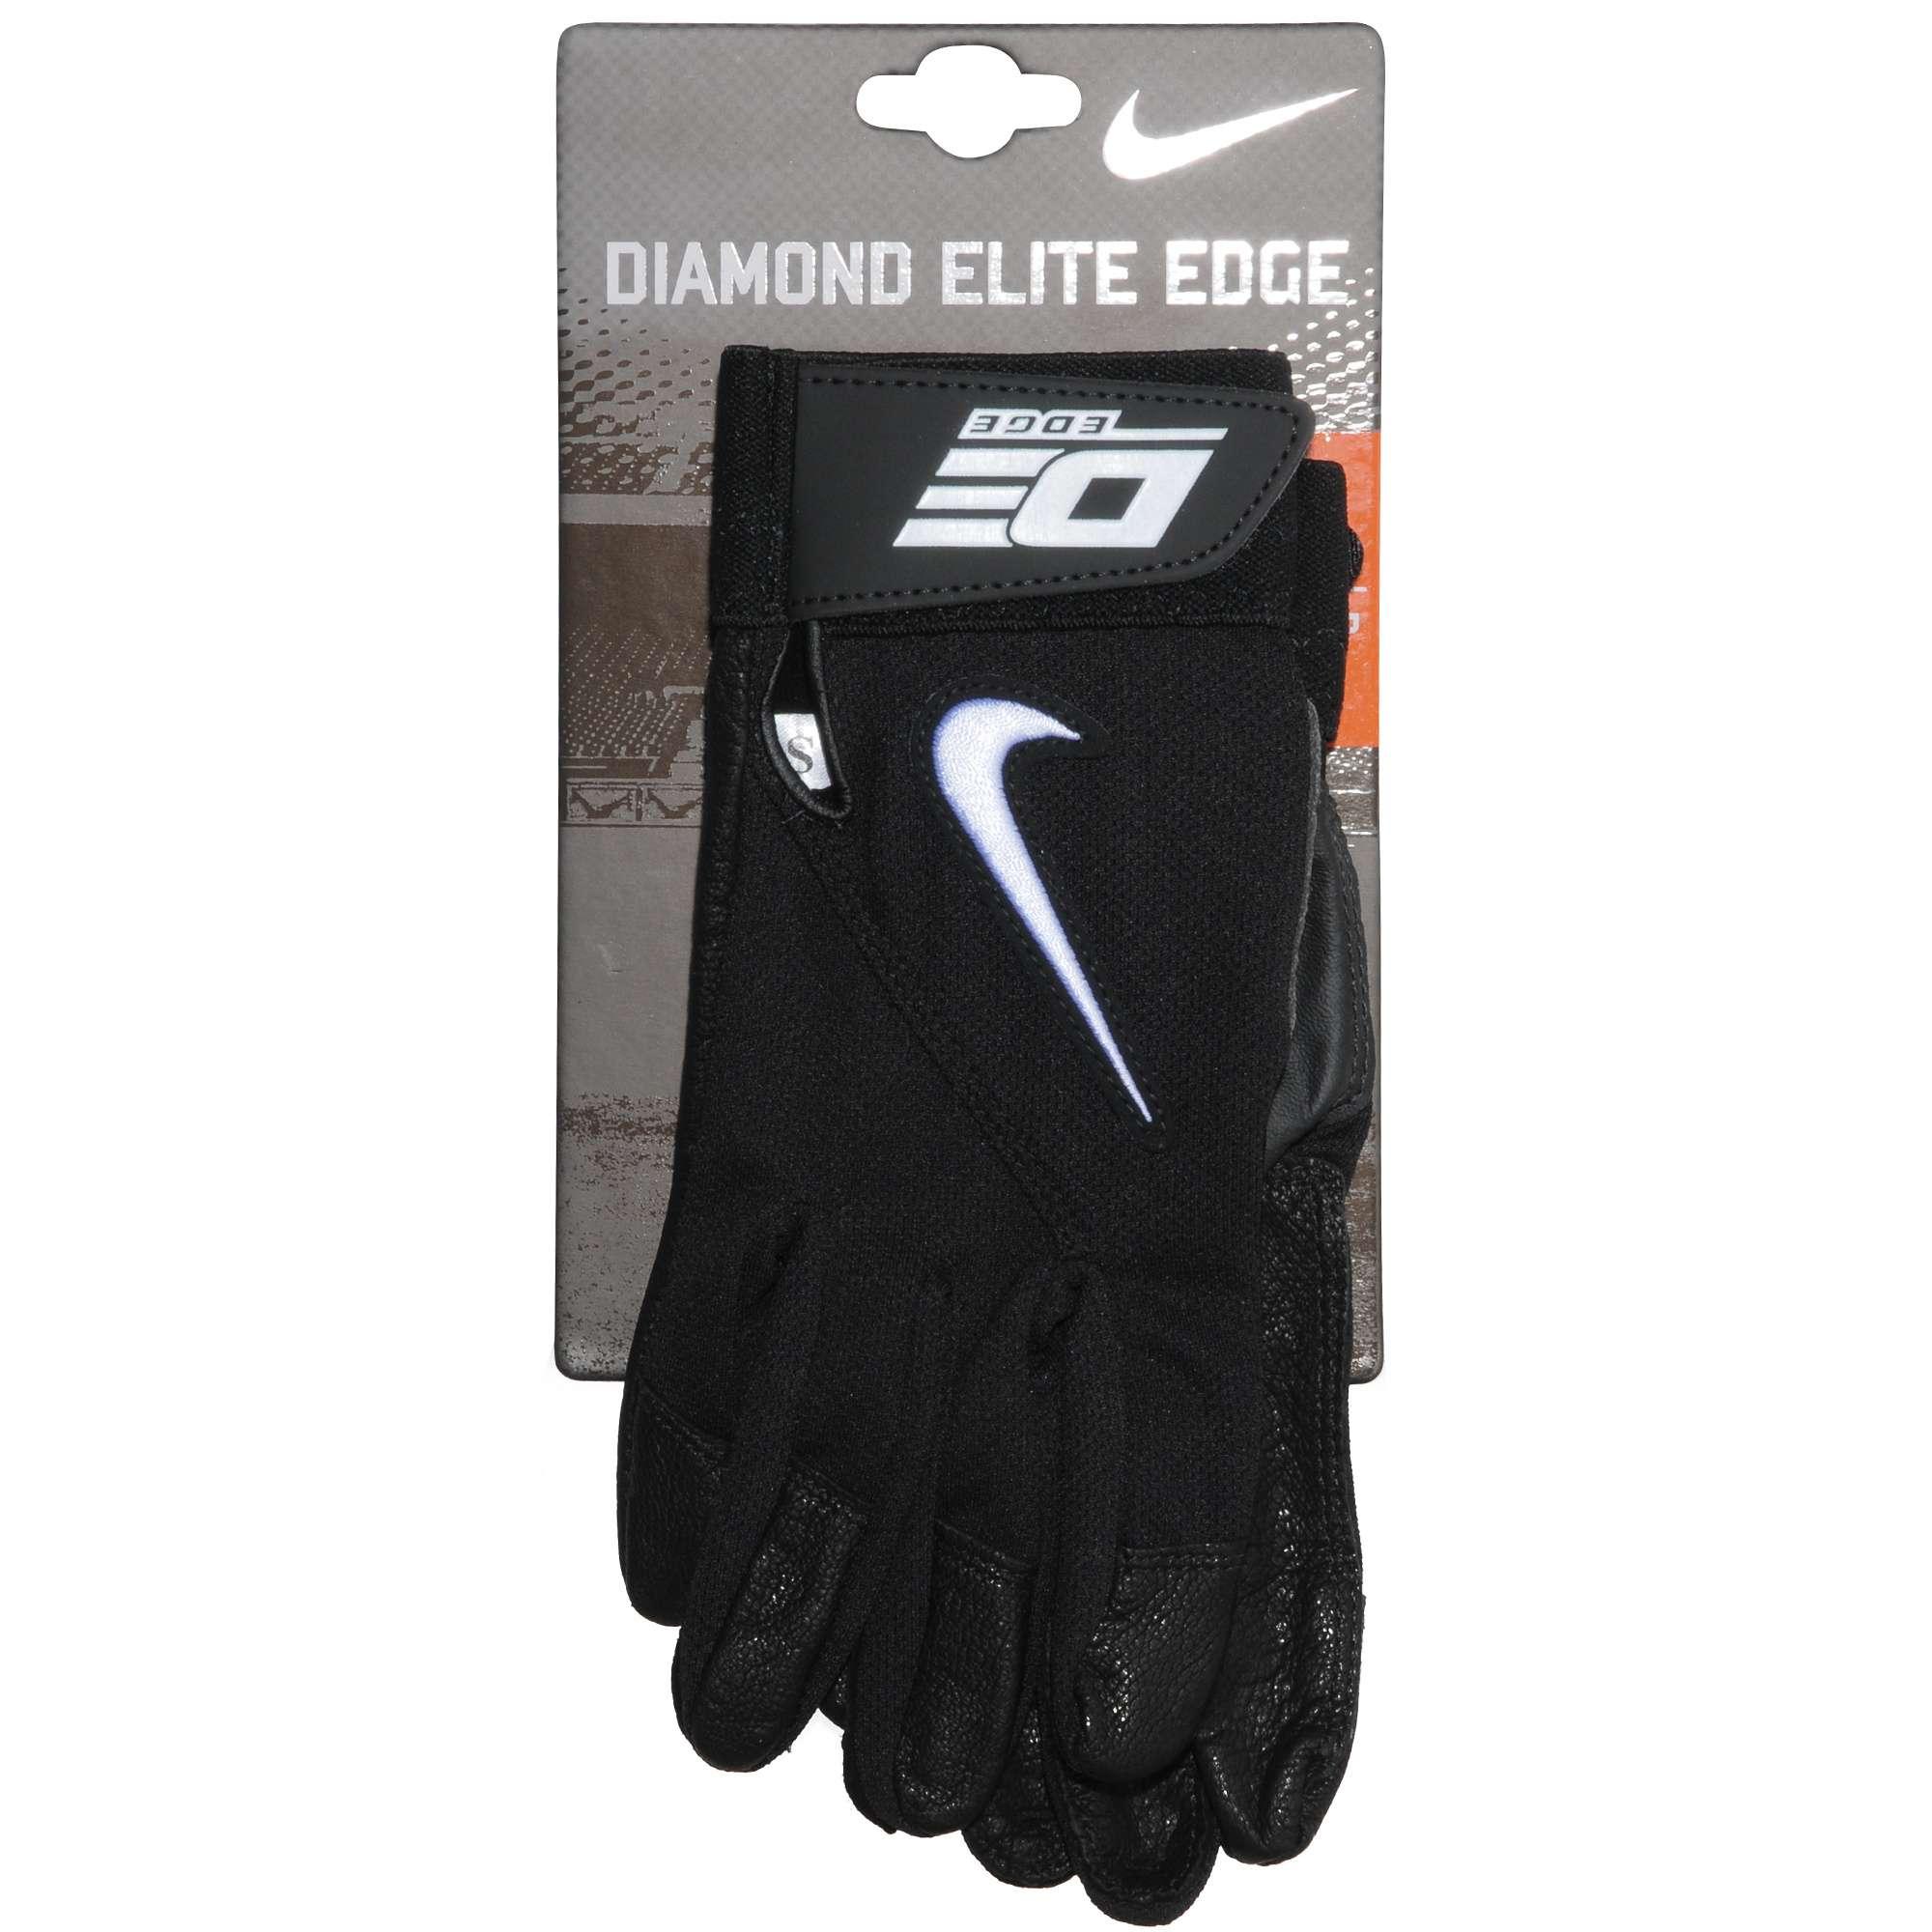 Nike Diamond Elite Edge Batting Gloves